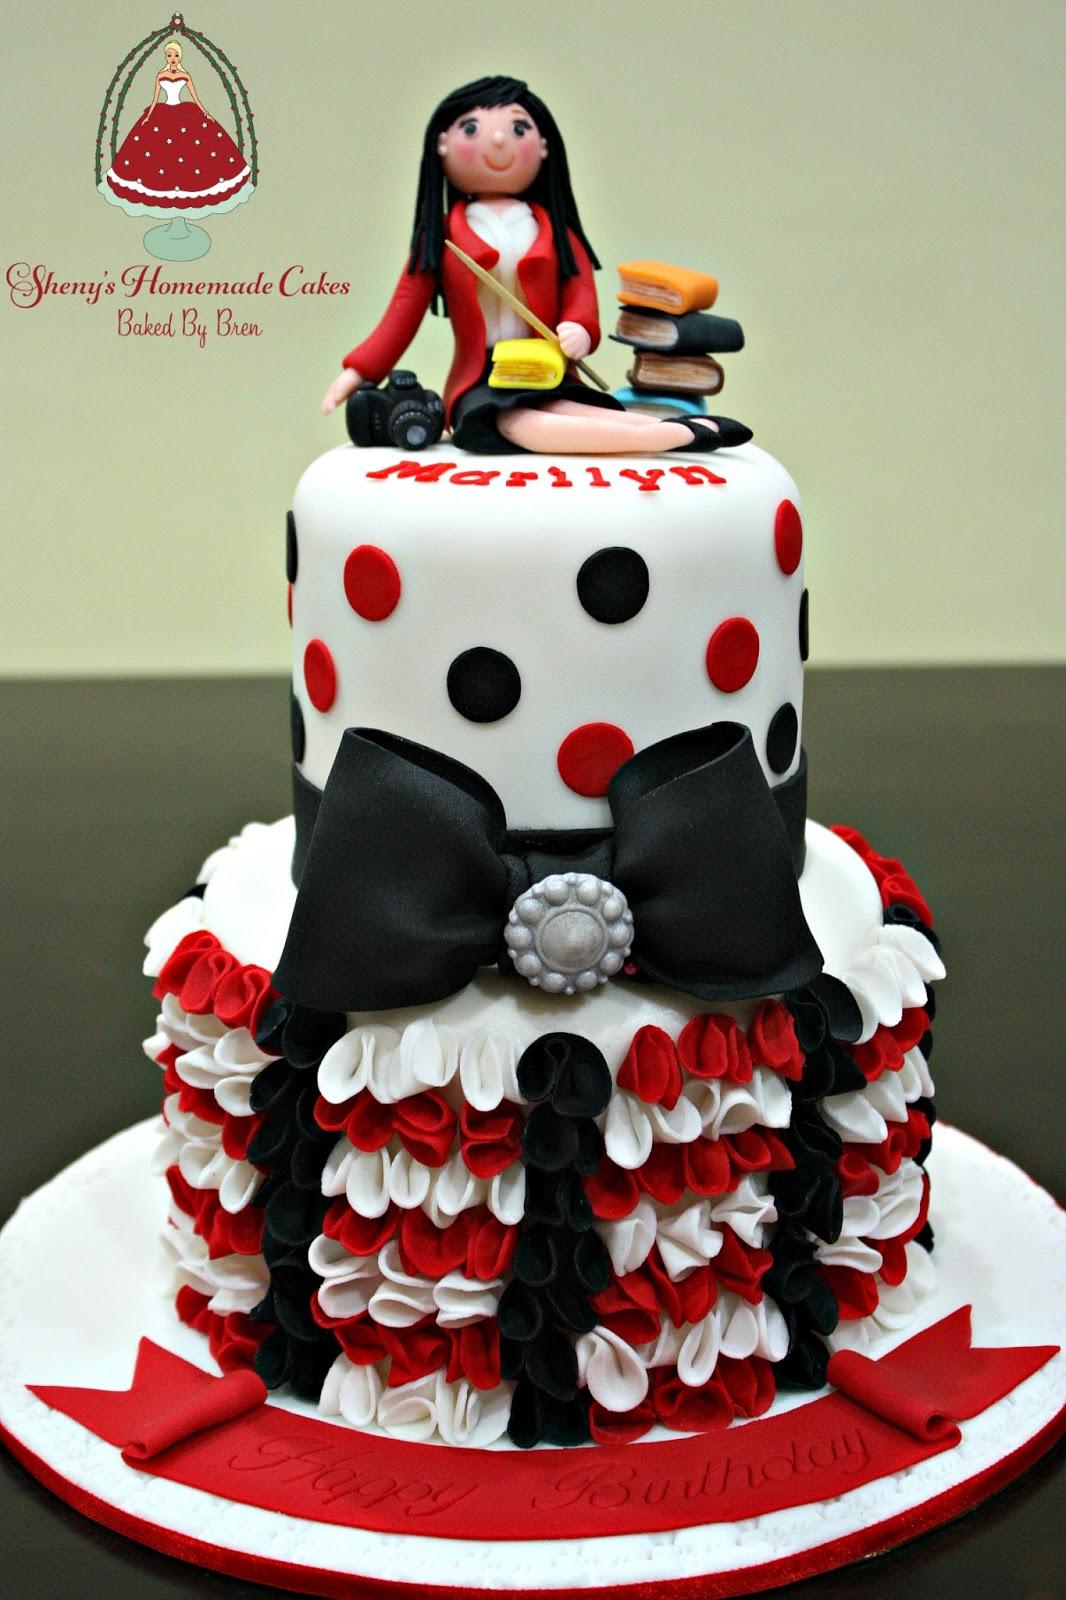 Shenys Homemade Treats Red Black and White Birthday Cake